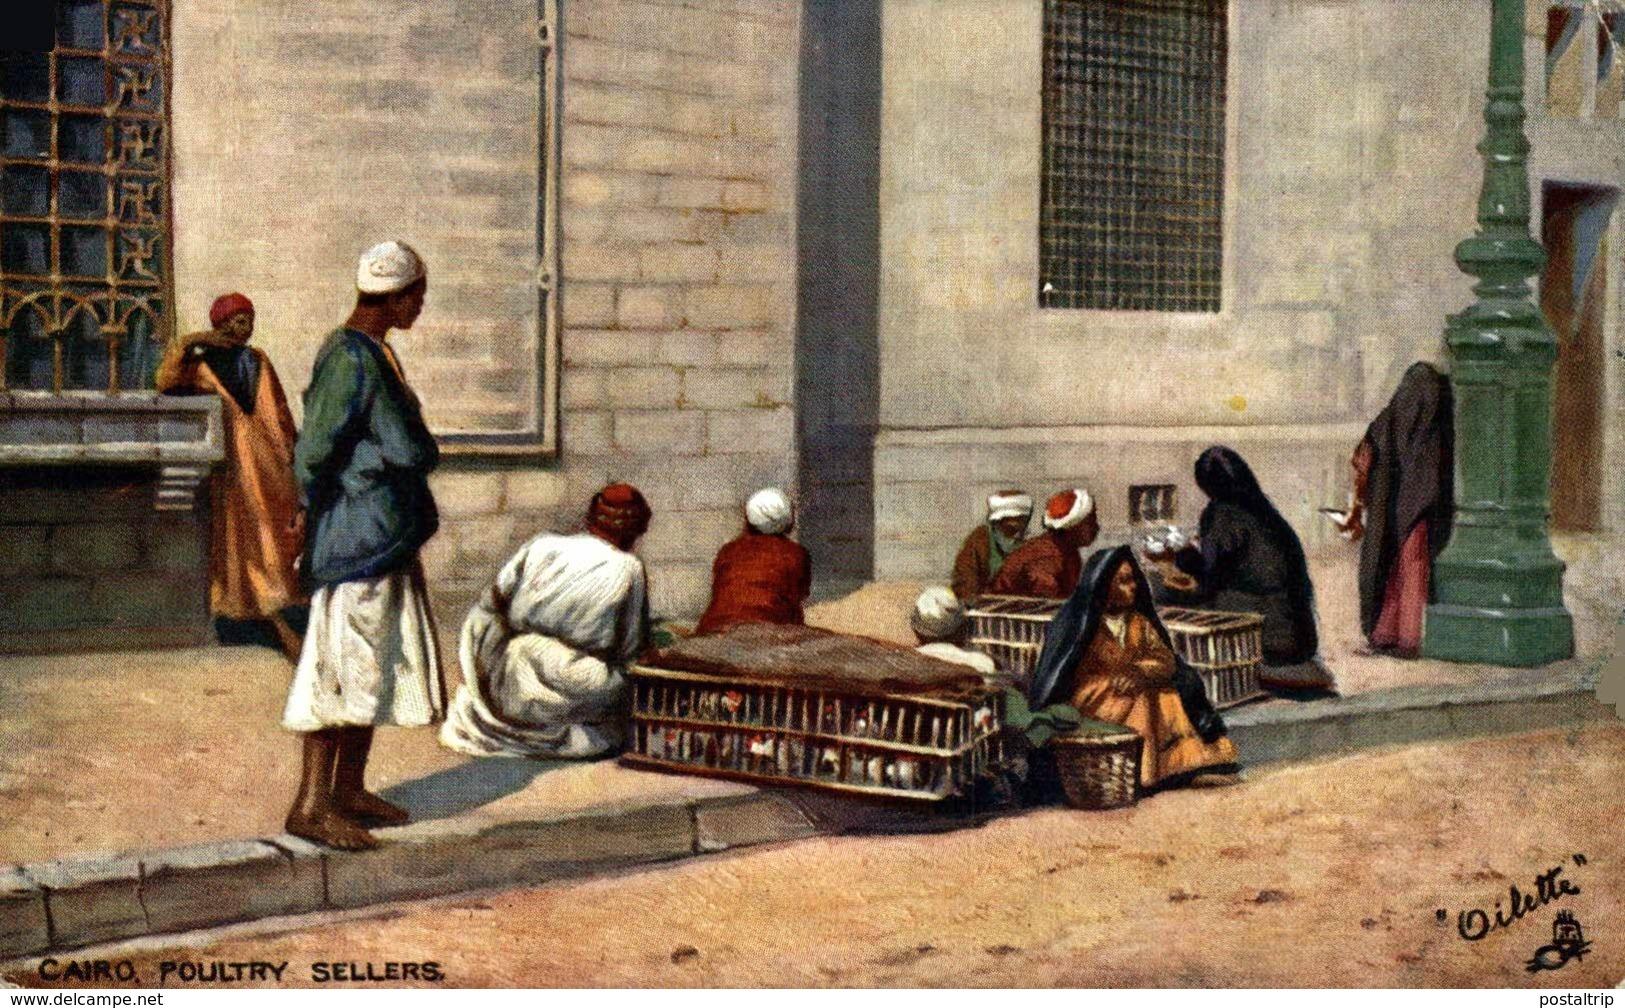 CAIRO POULTRY SELLERS Egypt EGYPTE - EGYPT - El Cairo